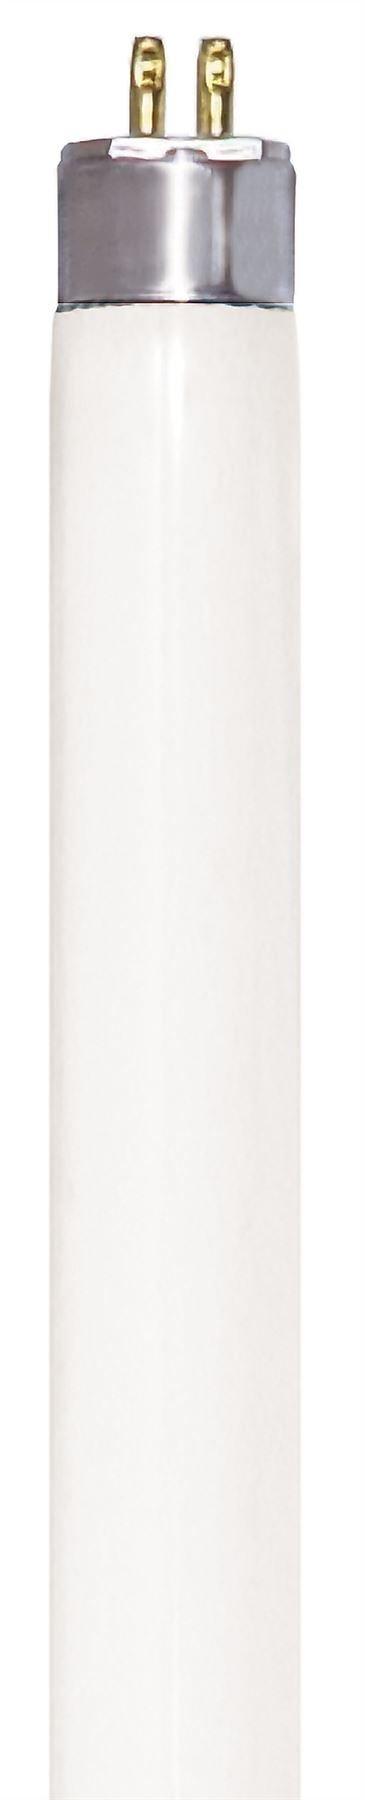 SYLVANIA 20904 - FP54/835/HO/ECO - 54 Watt Fluorescent Tube - T5 High Output - 3500K - 800 Series Phosphors - Case of 40